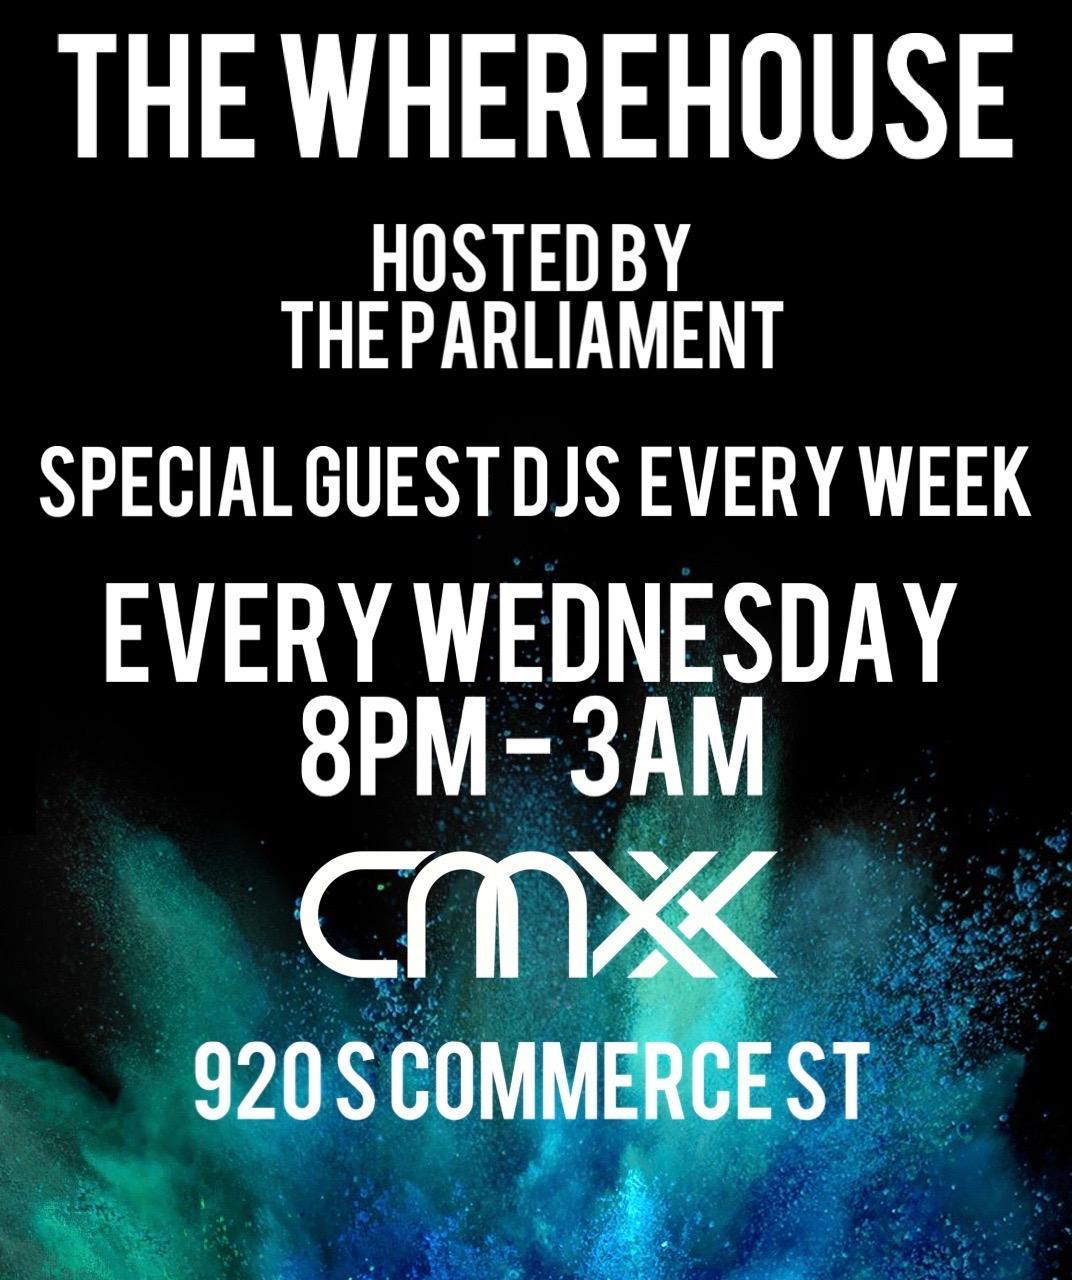 WHEREHOUSE WEDNESDAY | HOUSE MUSIC ALL NIGHT!